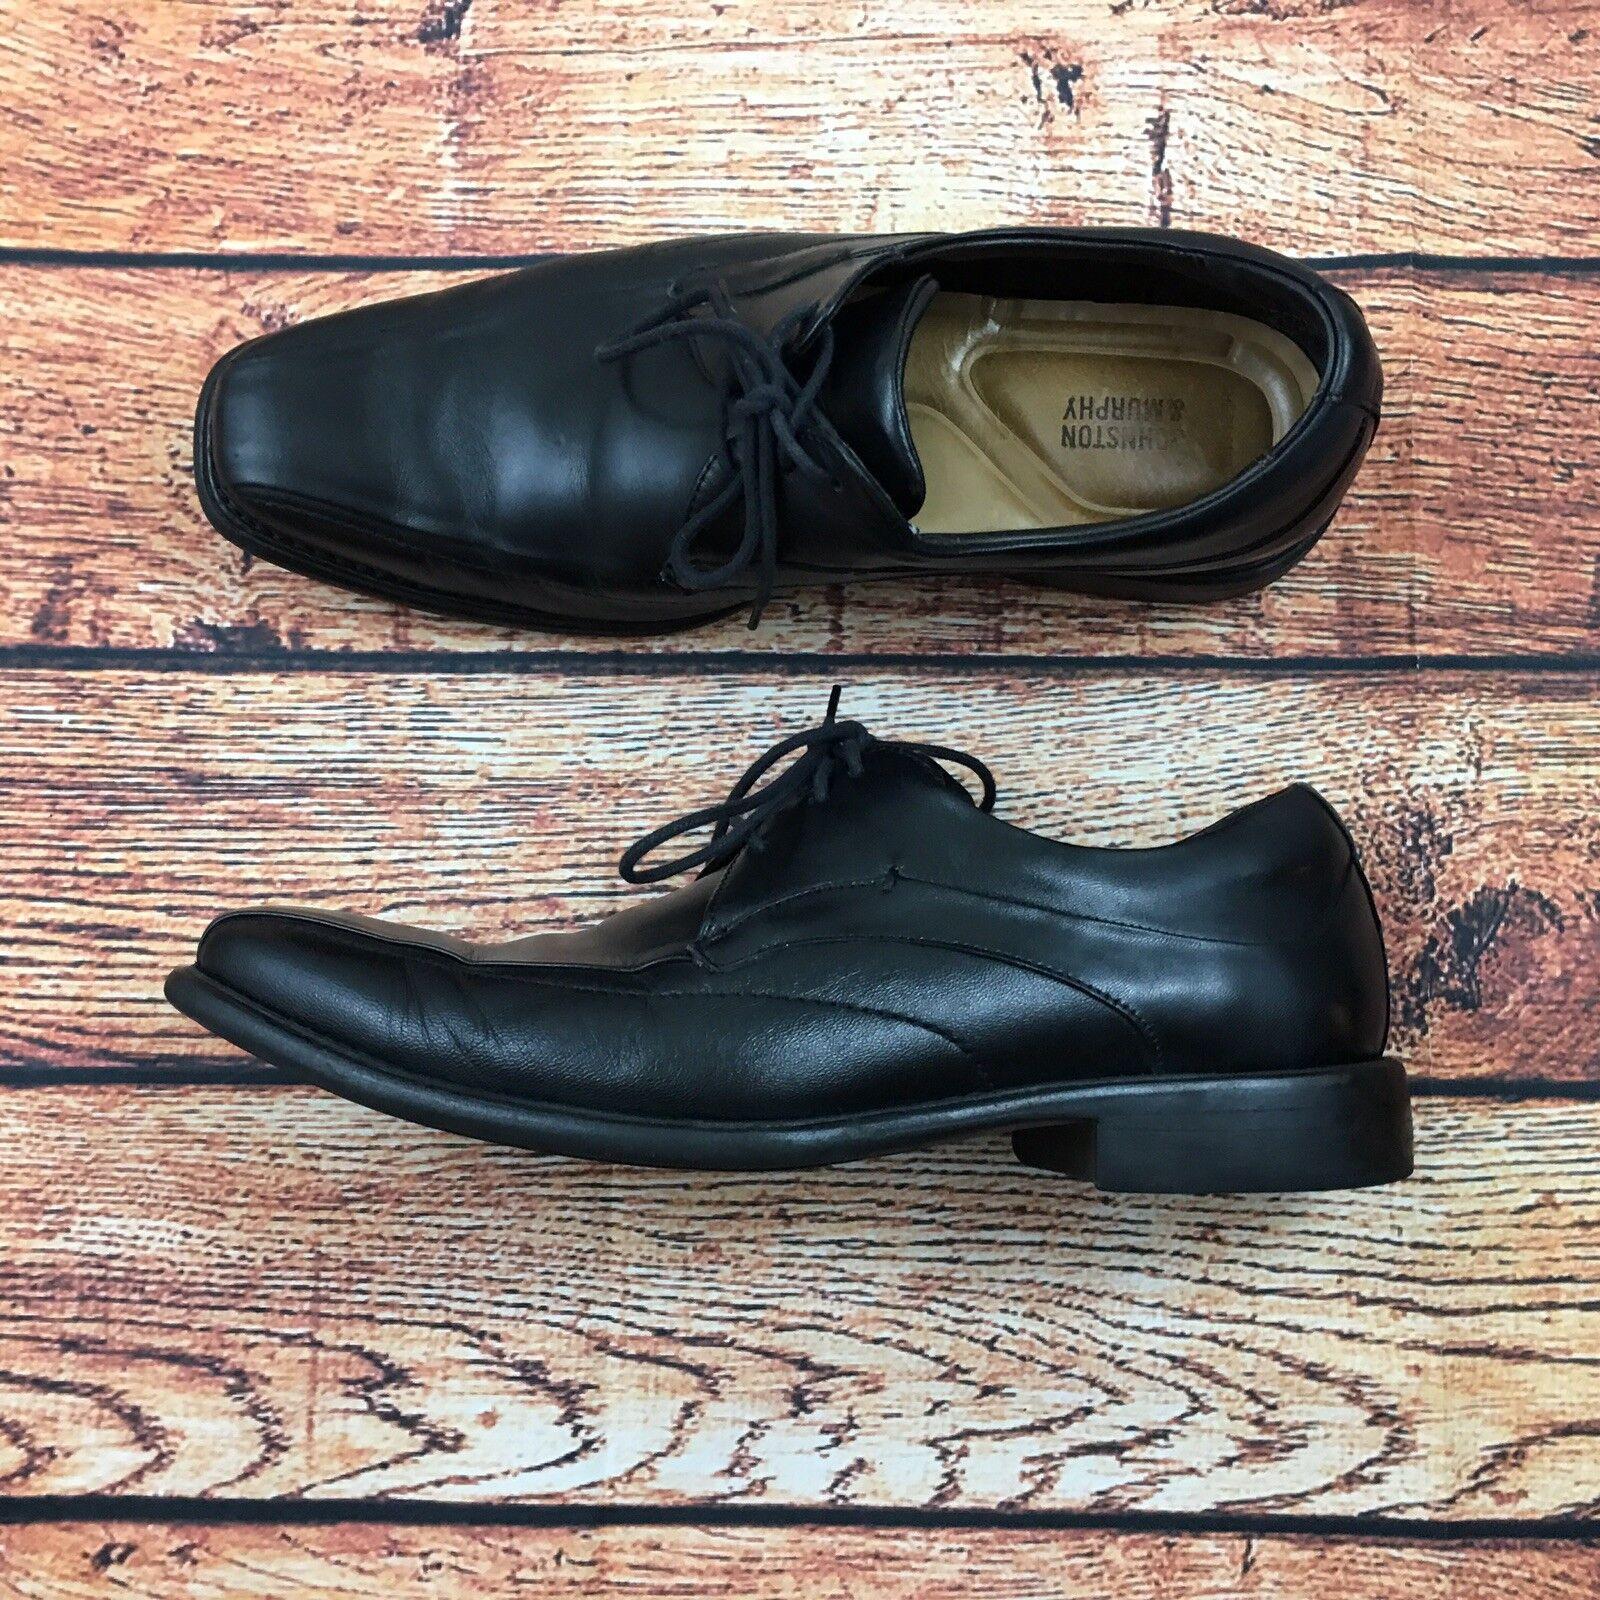 Johnston Leather & Murphy Men's 10M Tilden Black Leather Johnston Bike Toe Oxford Shoes 84259e